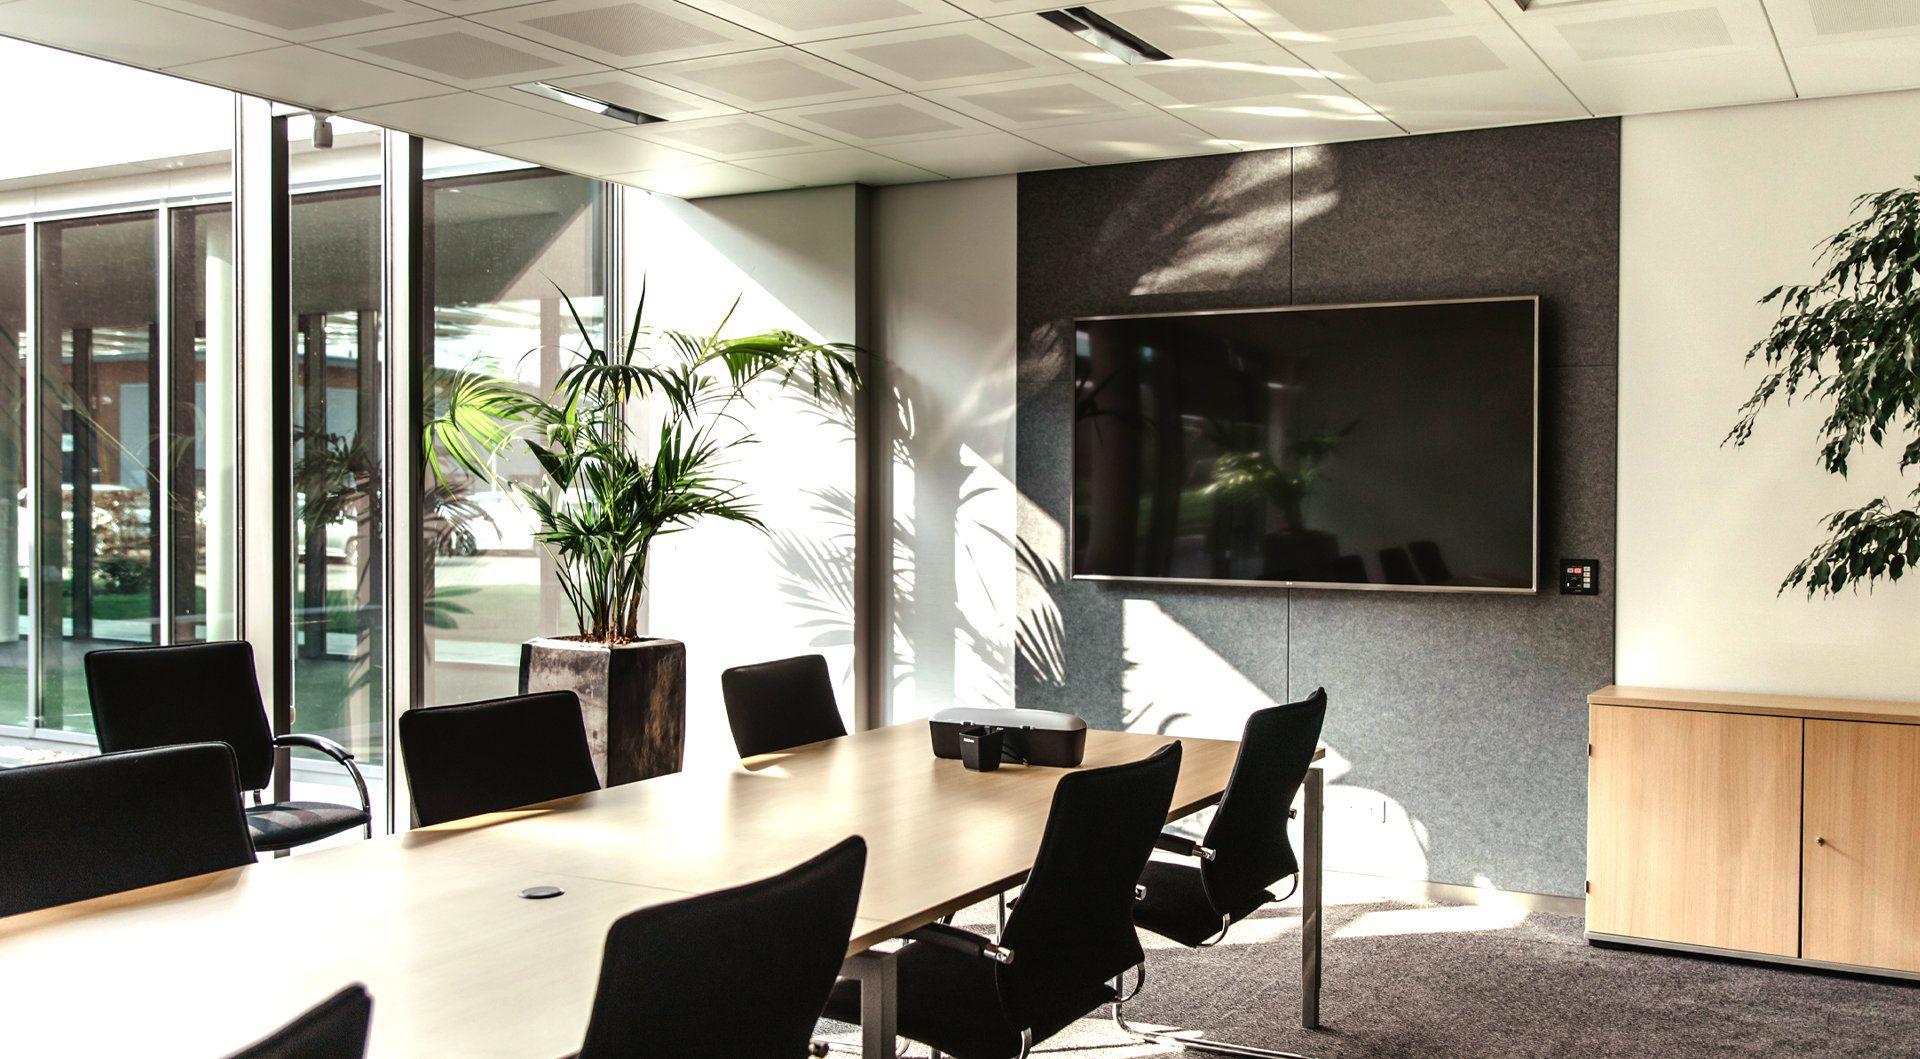 "iiyama ProLite E2083HSD-B1 LED display 49,5 cm (19.5"") 1600 x 900 Pixels HD+ Zwart - Case studie de vries"